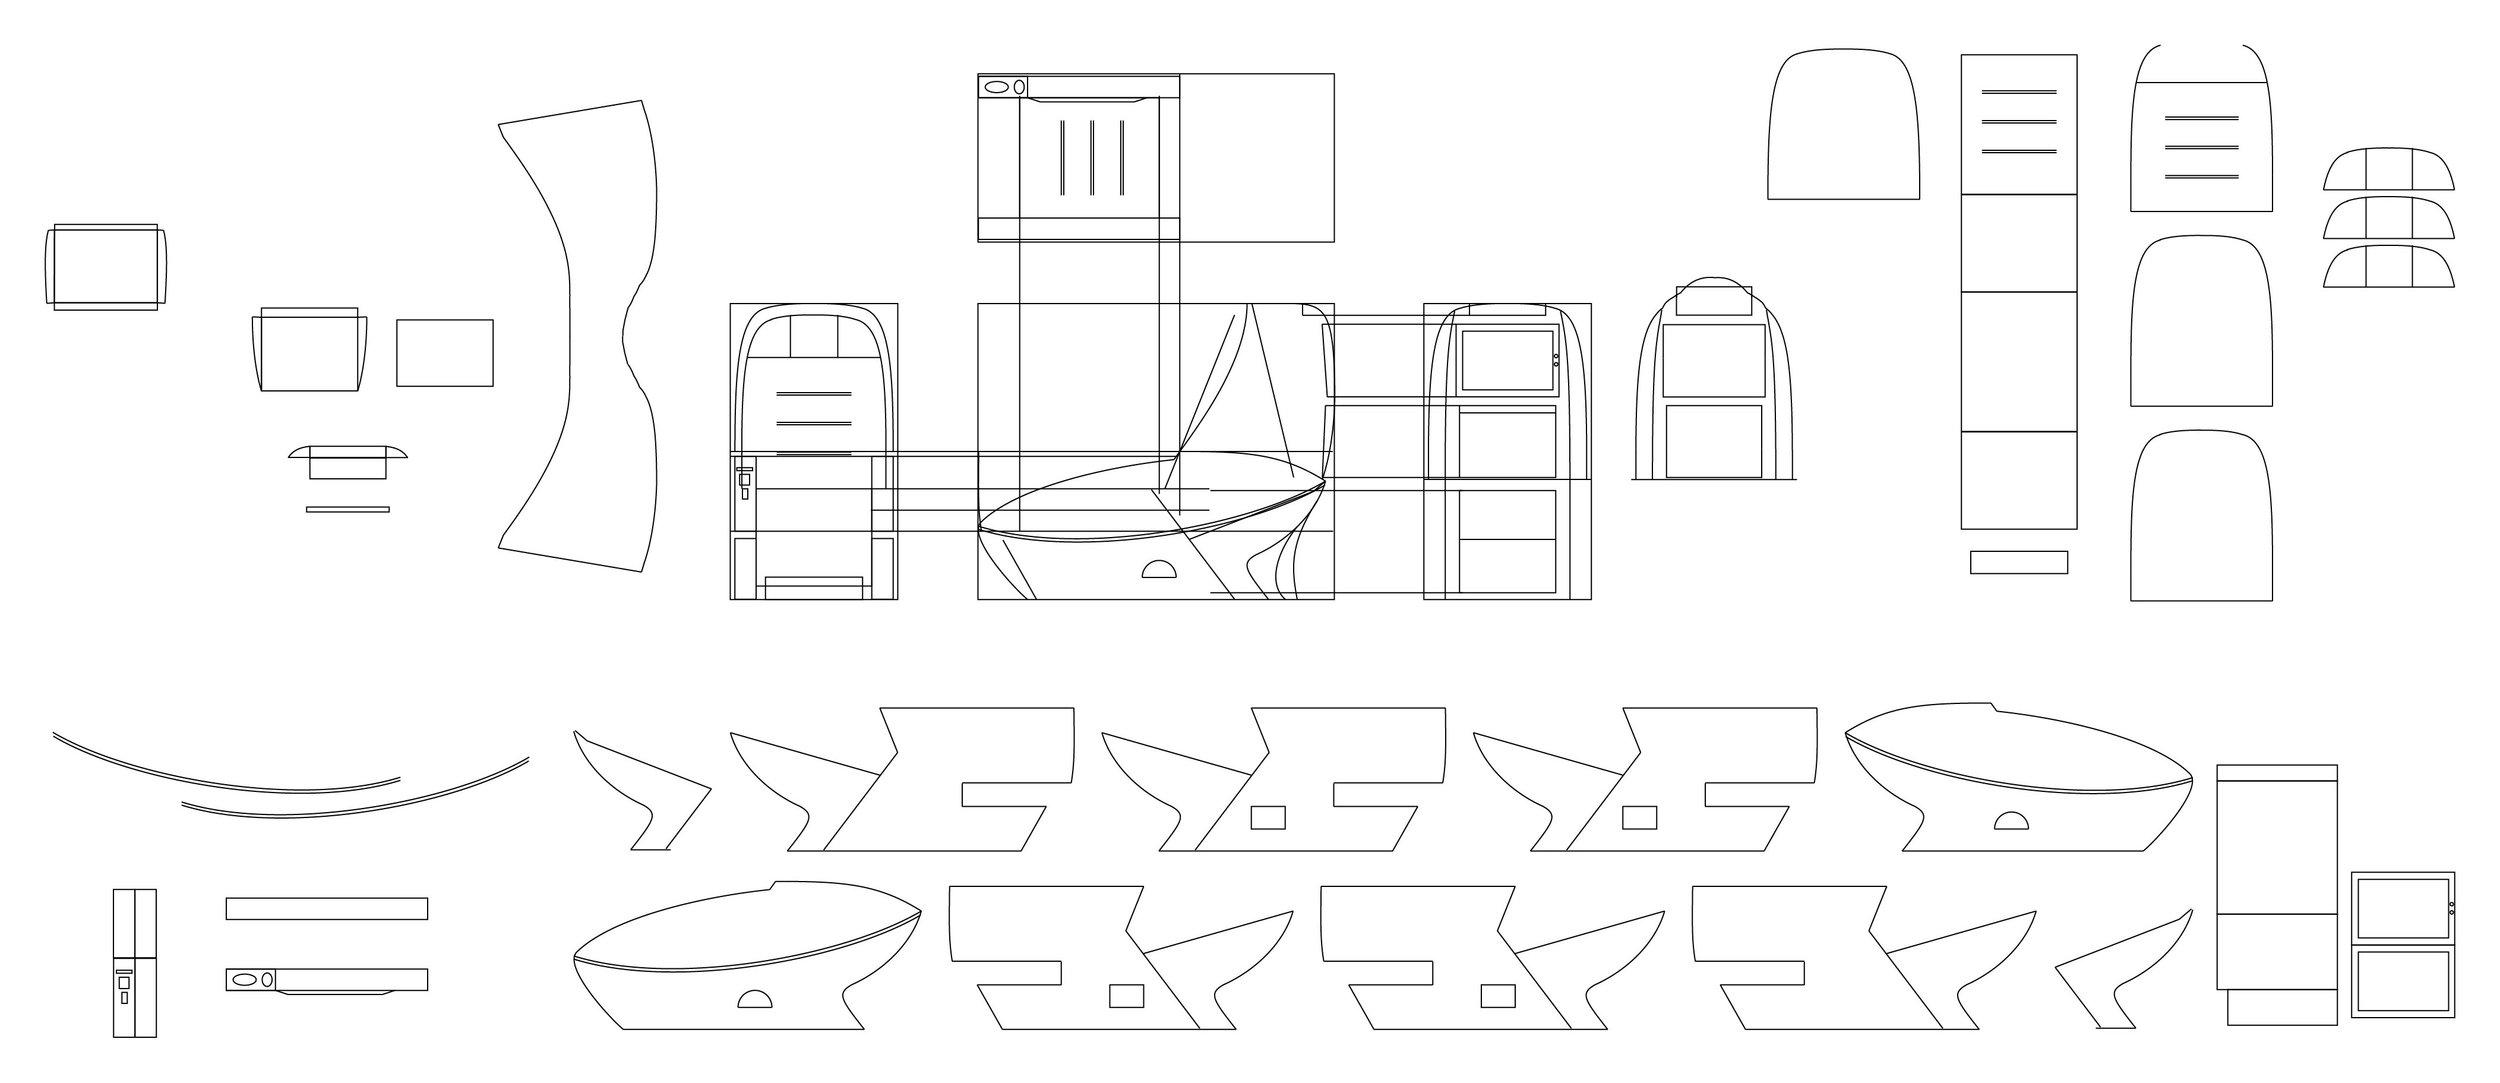 Cabin - business - drawings 2.jpg